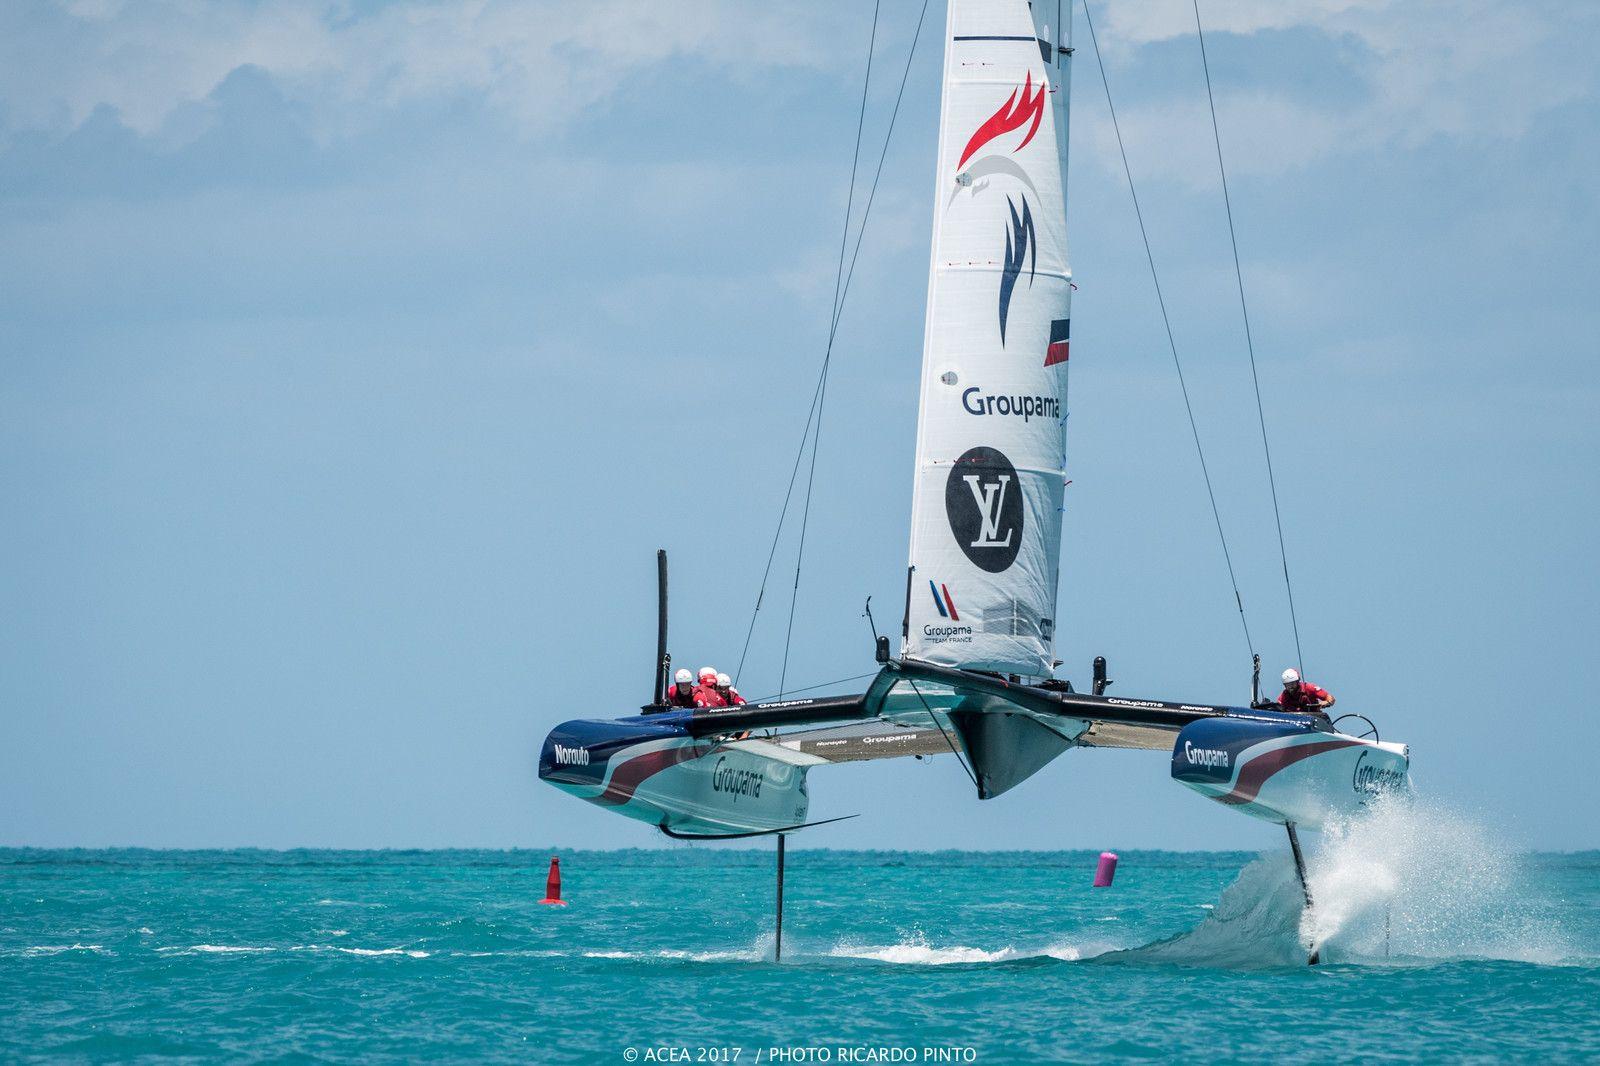 America S Cup Bermuda 2017 Final Practice Race Period Day 2 Results Catamaran Racing News Design Catamaran Sailing Catamaran Sailing Yacht